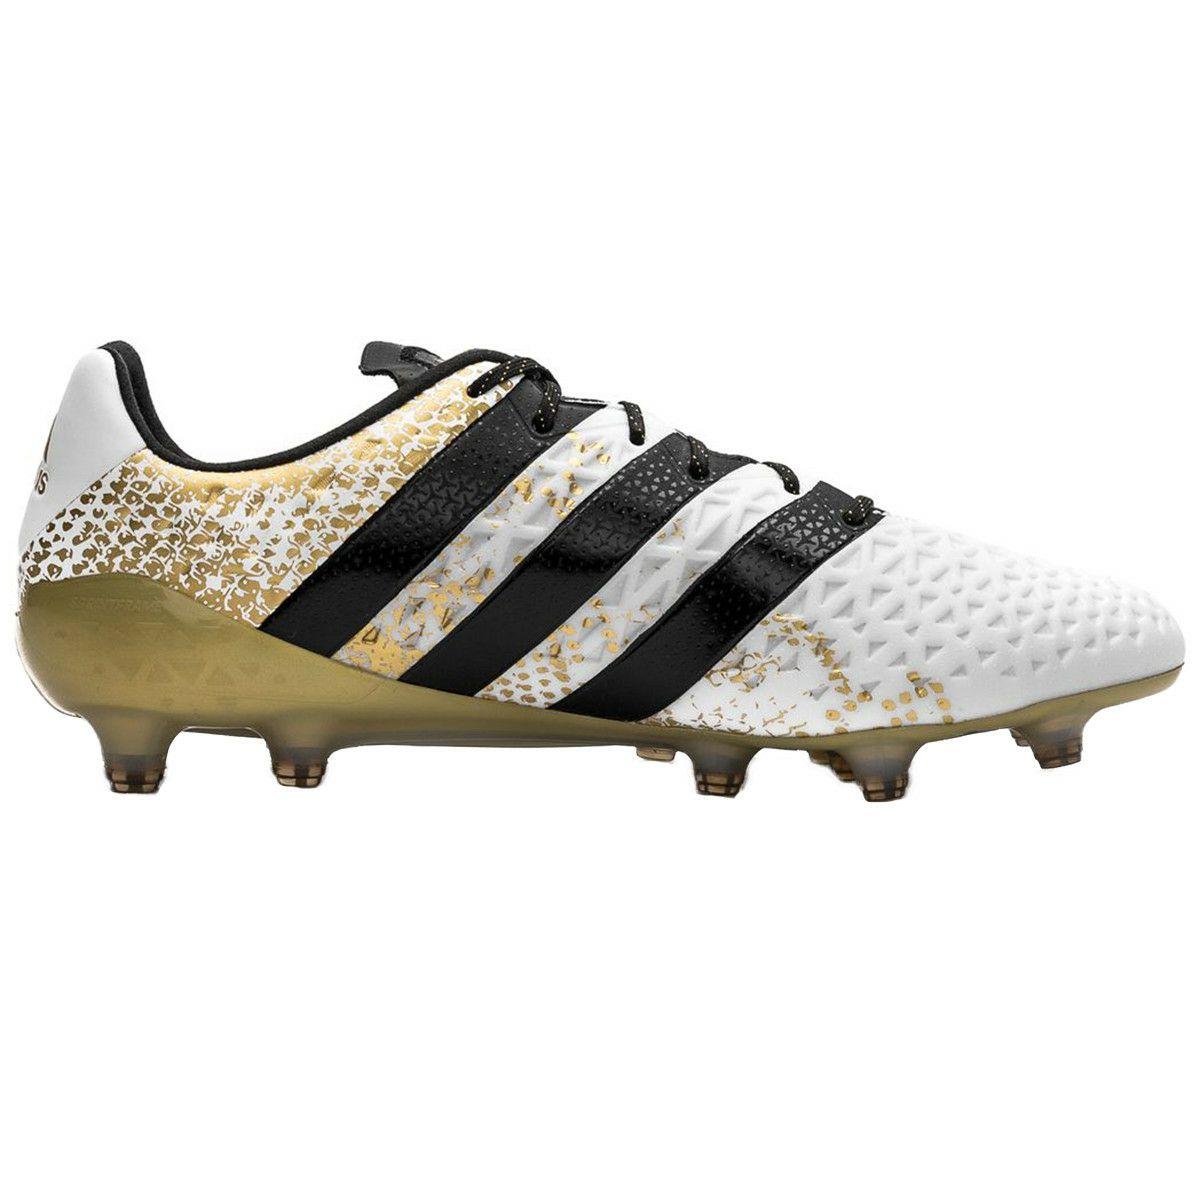 Chaussures de Football homme Adidas Ace 16.1 Fg